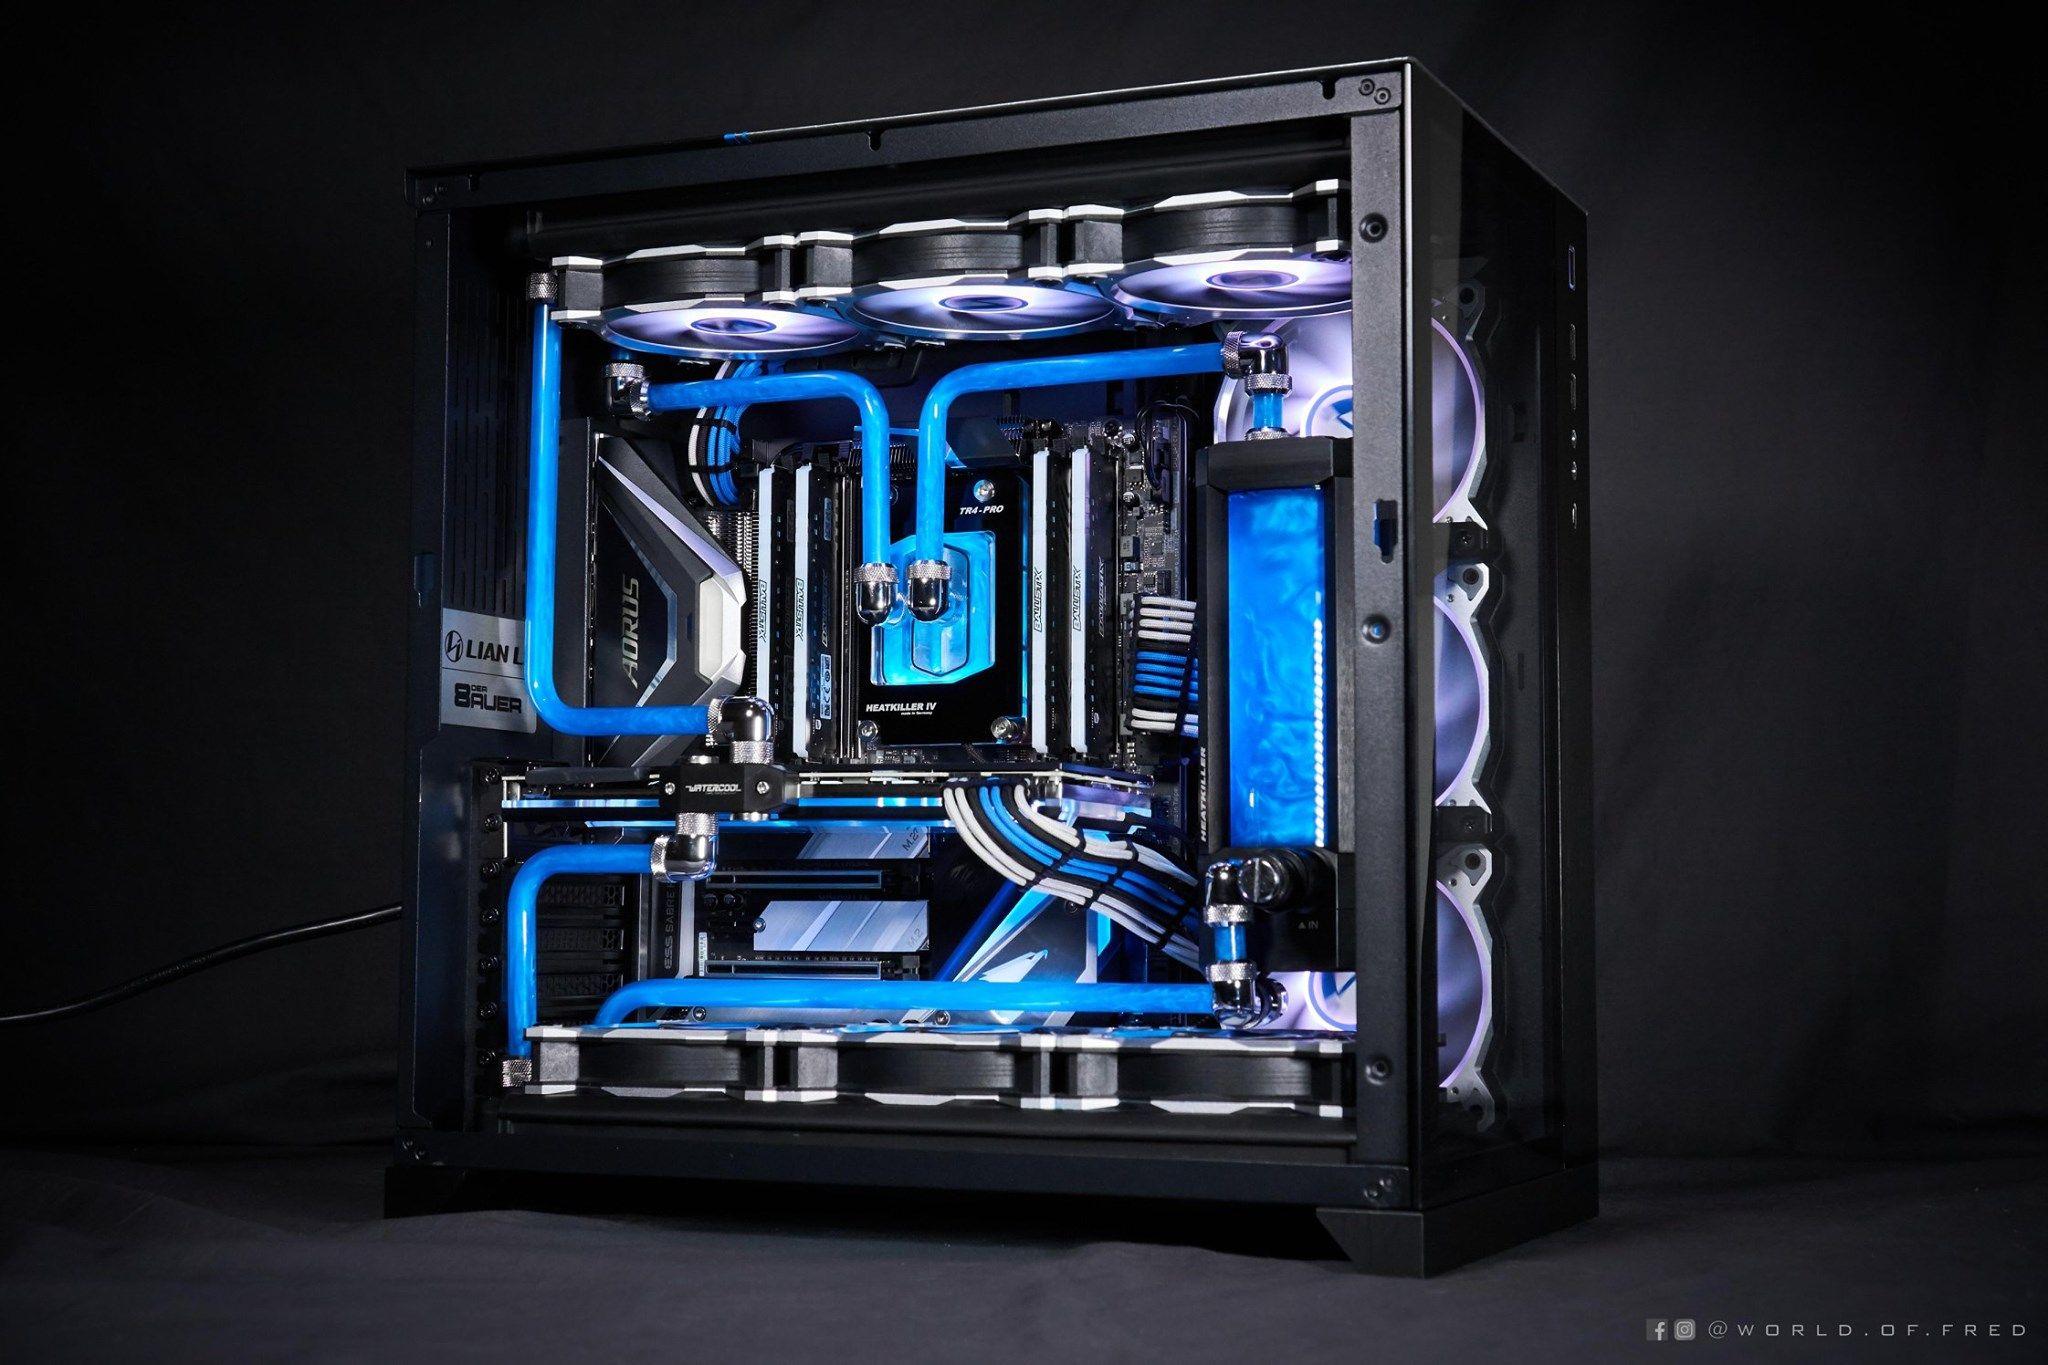 Extreme Gaming Pc Build Is Custom Water Cooled Lian Li 001 Dynamic Rig In 2020 Gaming Computer Setup Gaming Machine Custom Computer